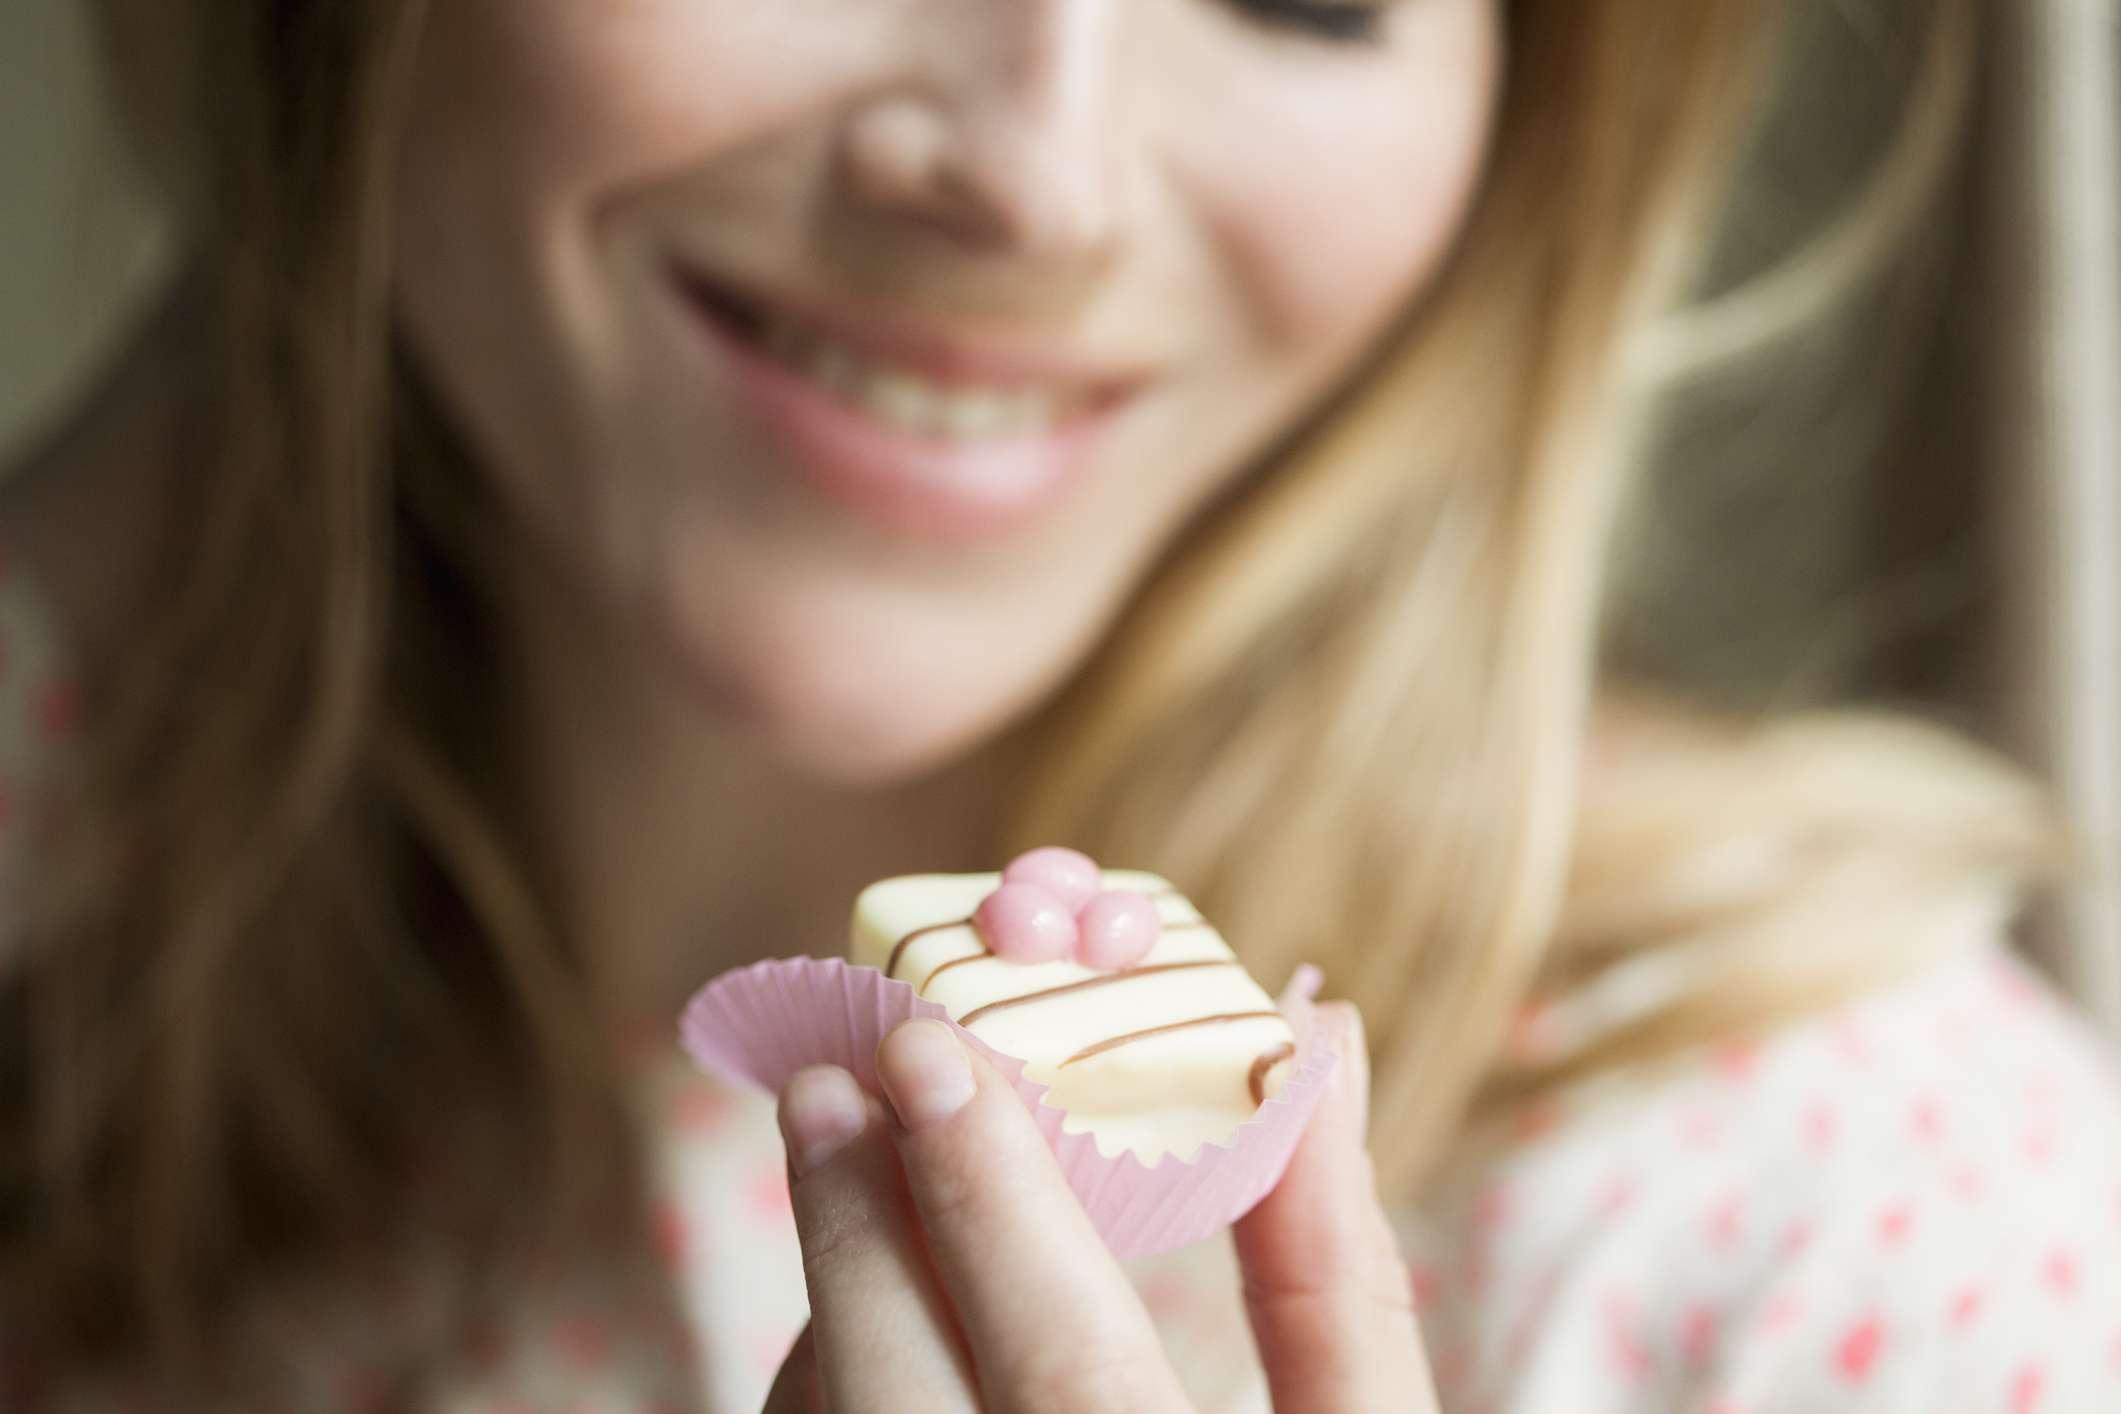 Woman eating a cupcake